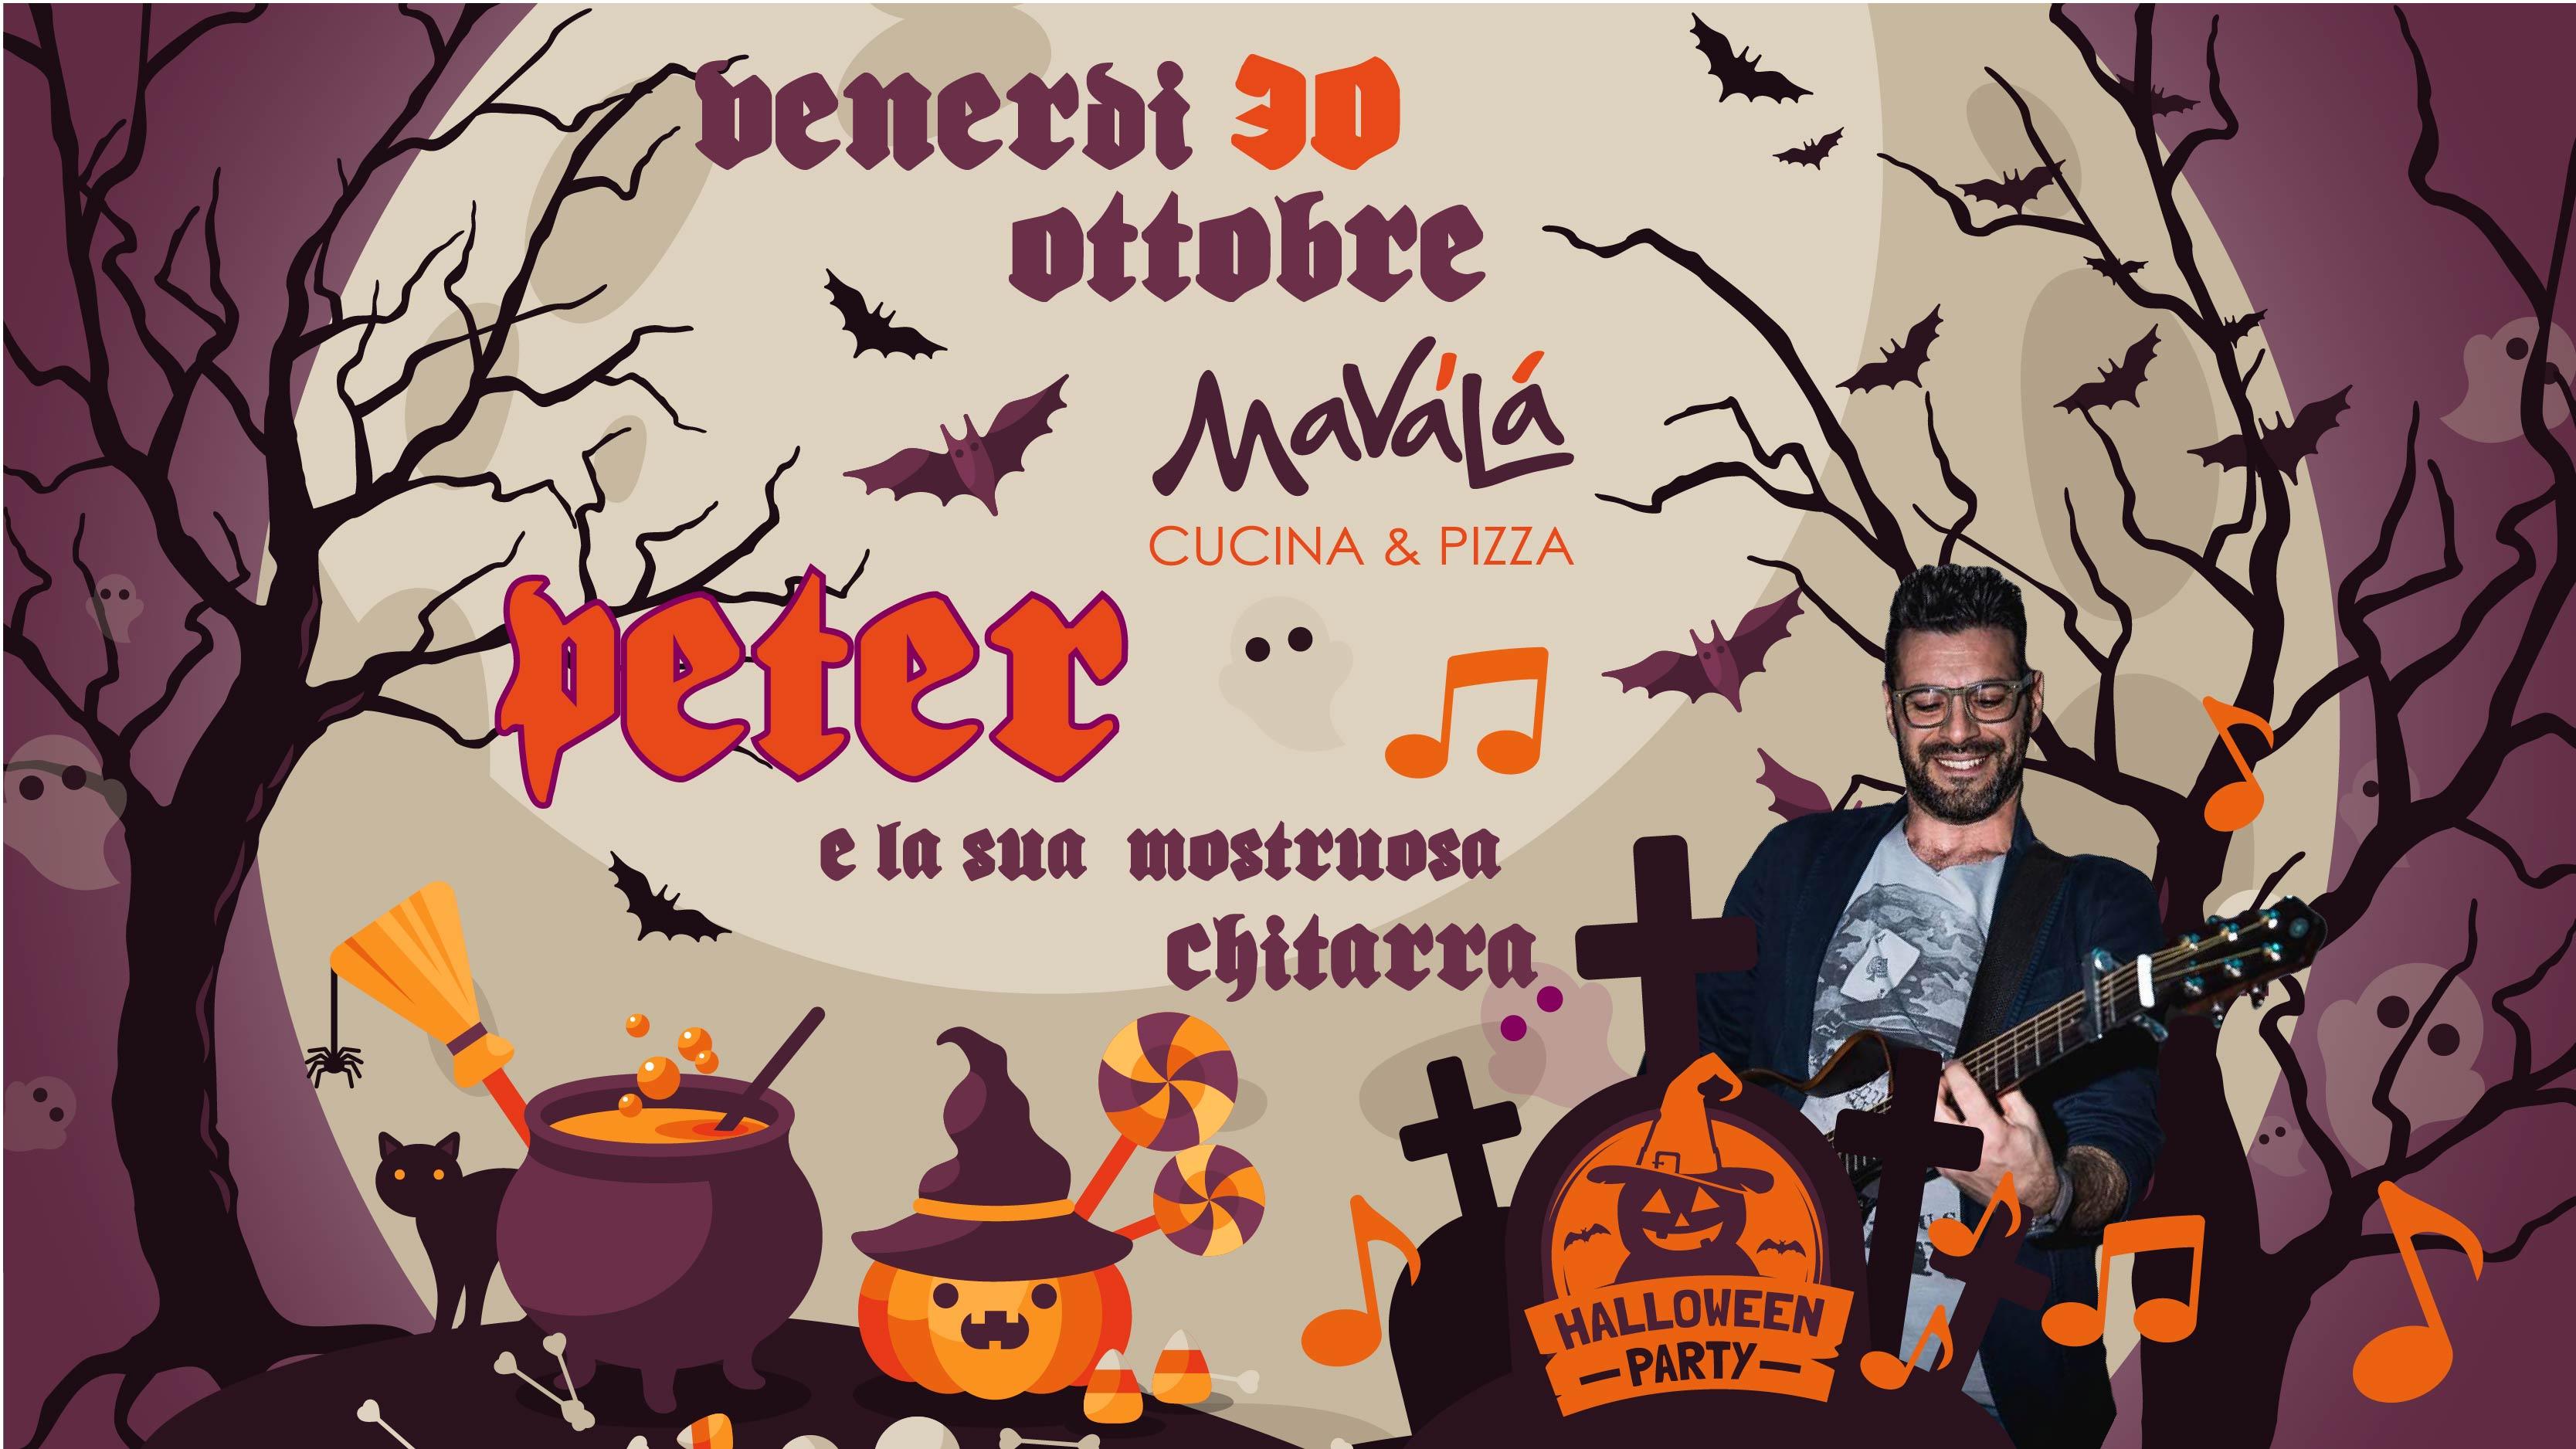 MAVALA_LOCANDINE_30_OTTOBRE_PETER_OK-04